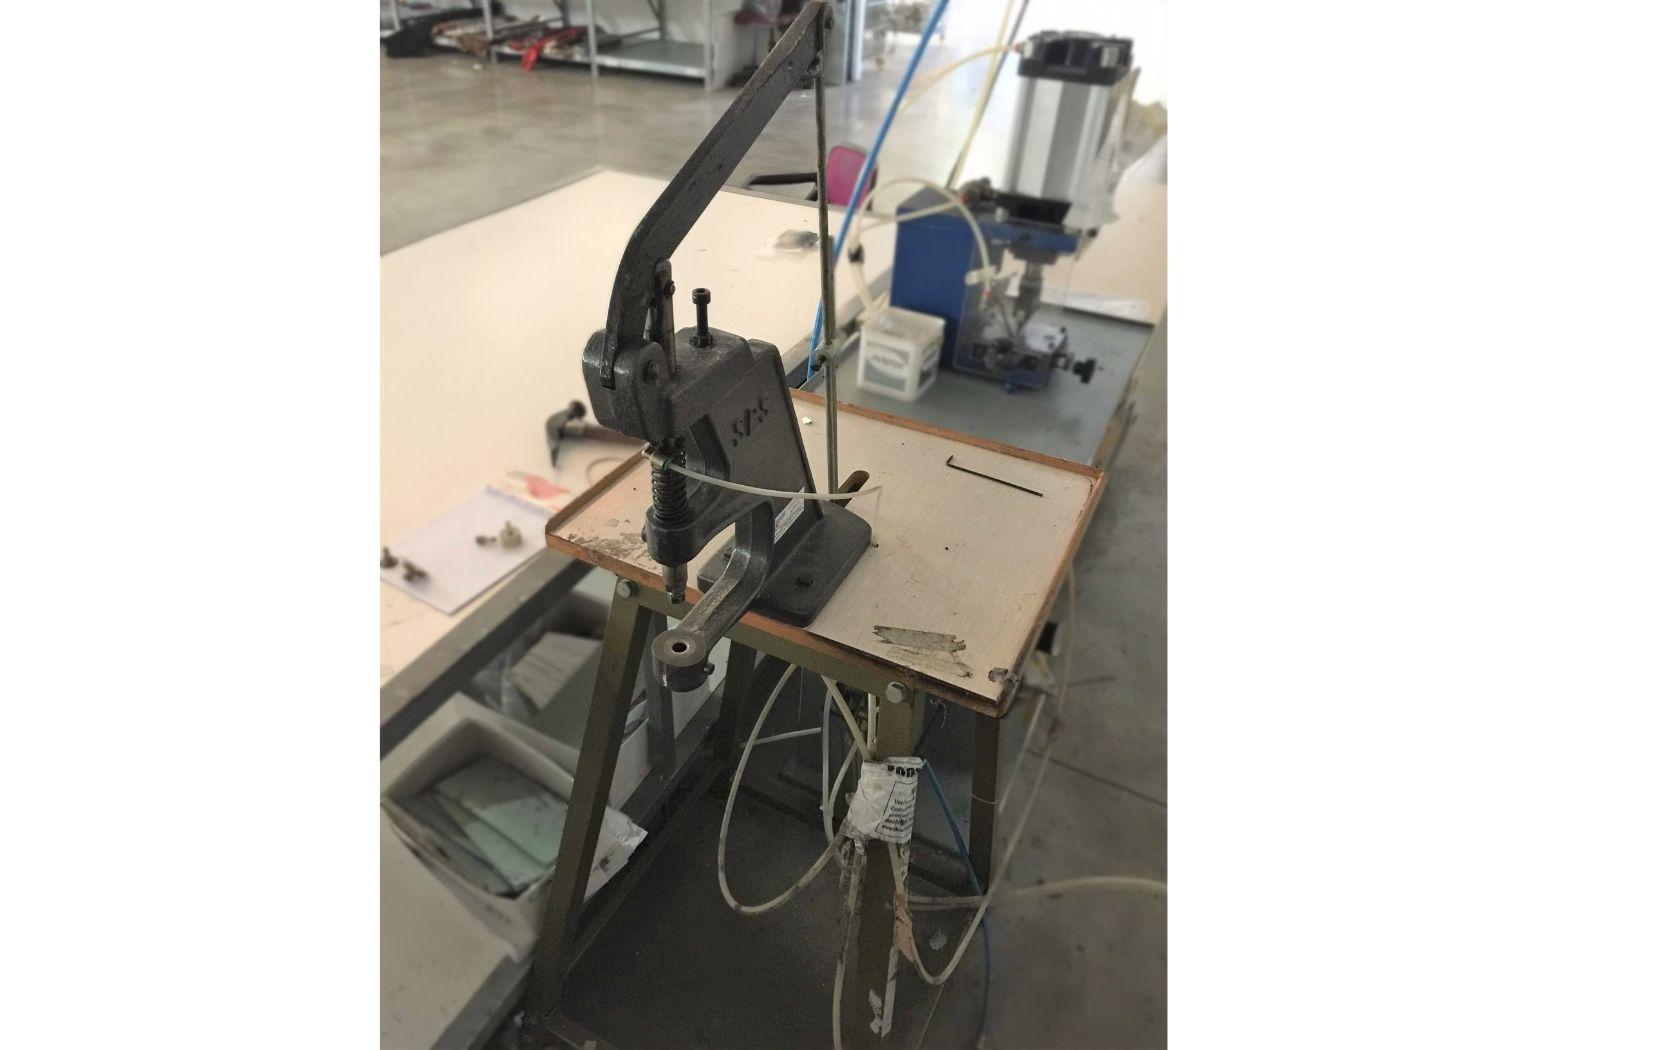 PERFORATING AND EYELETTING MACHINE